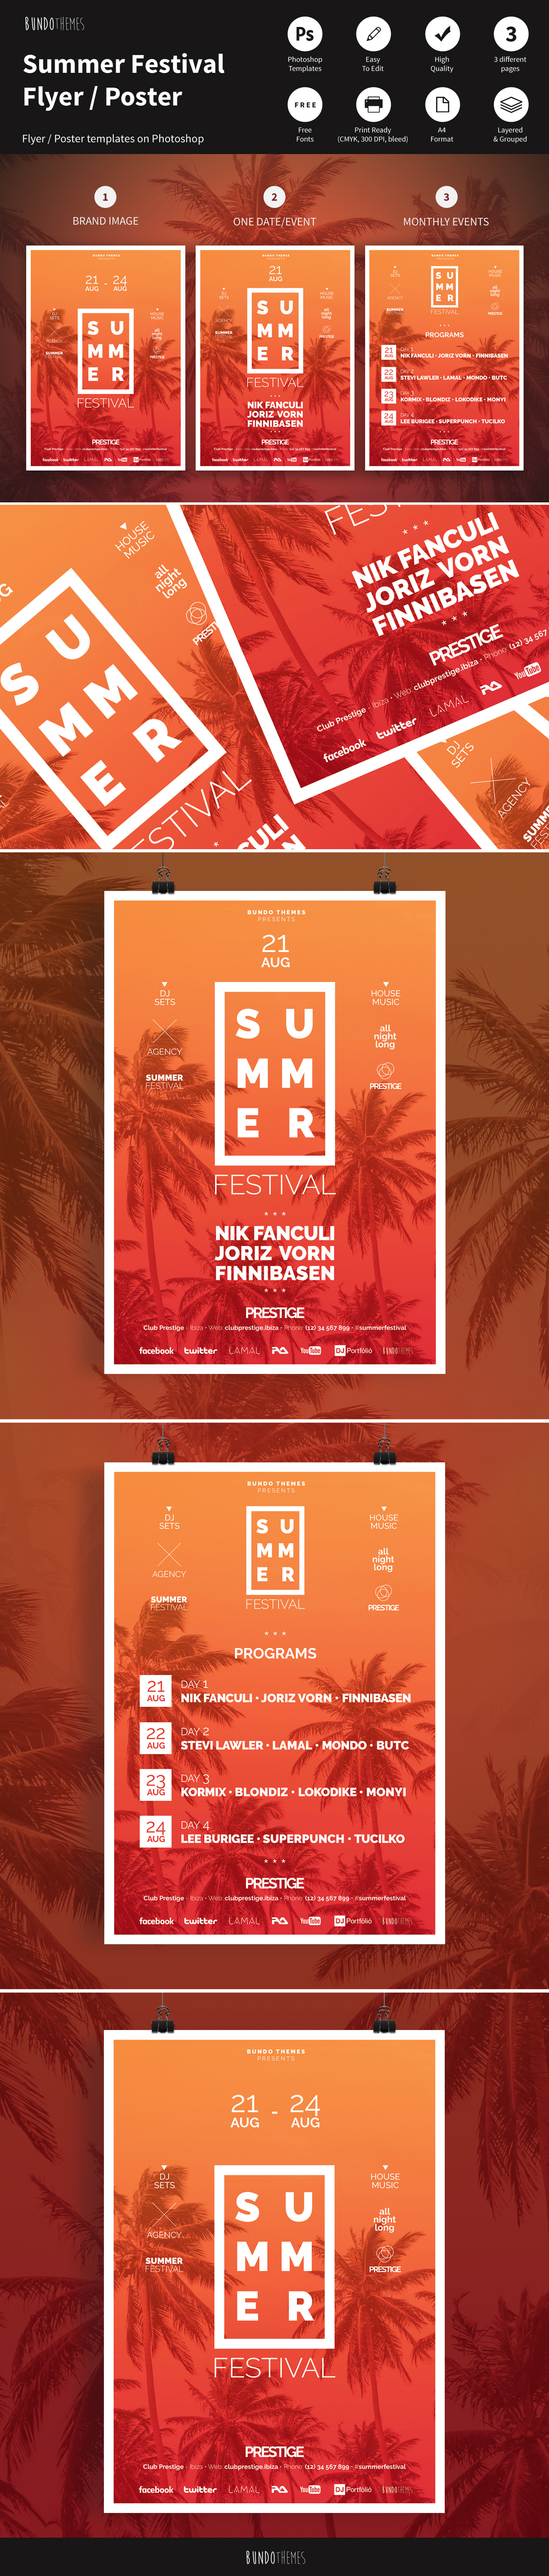 summer flyer flyer template print festival poster download club flyer dj